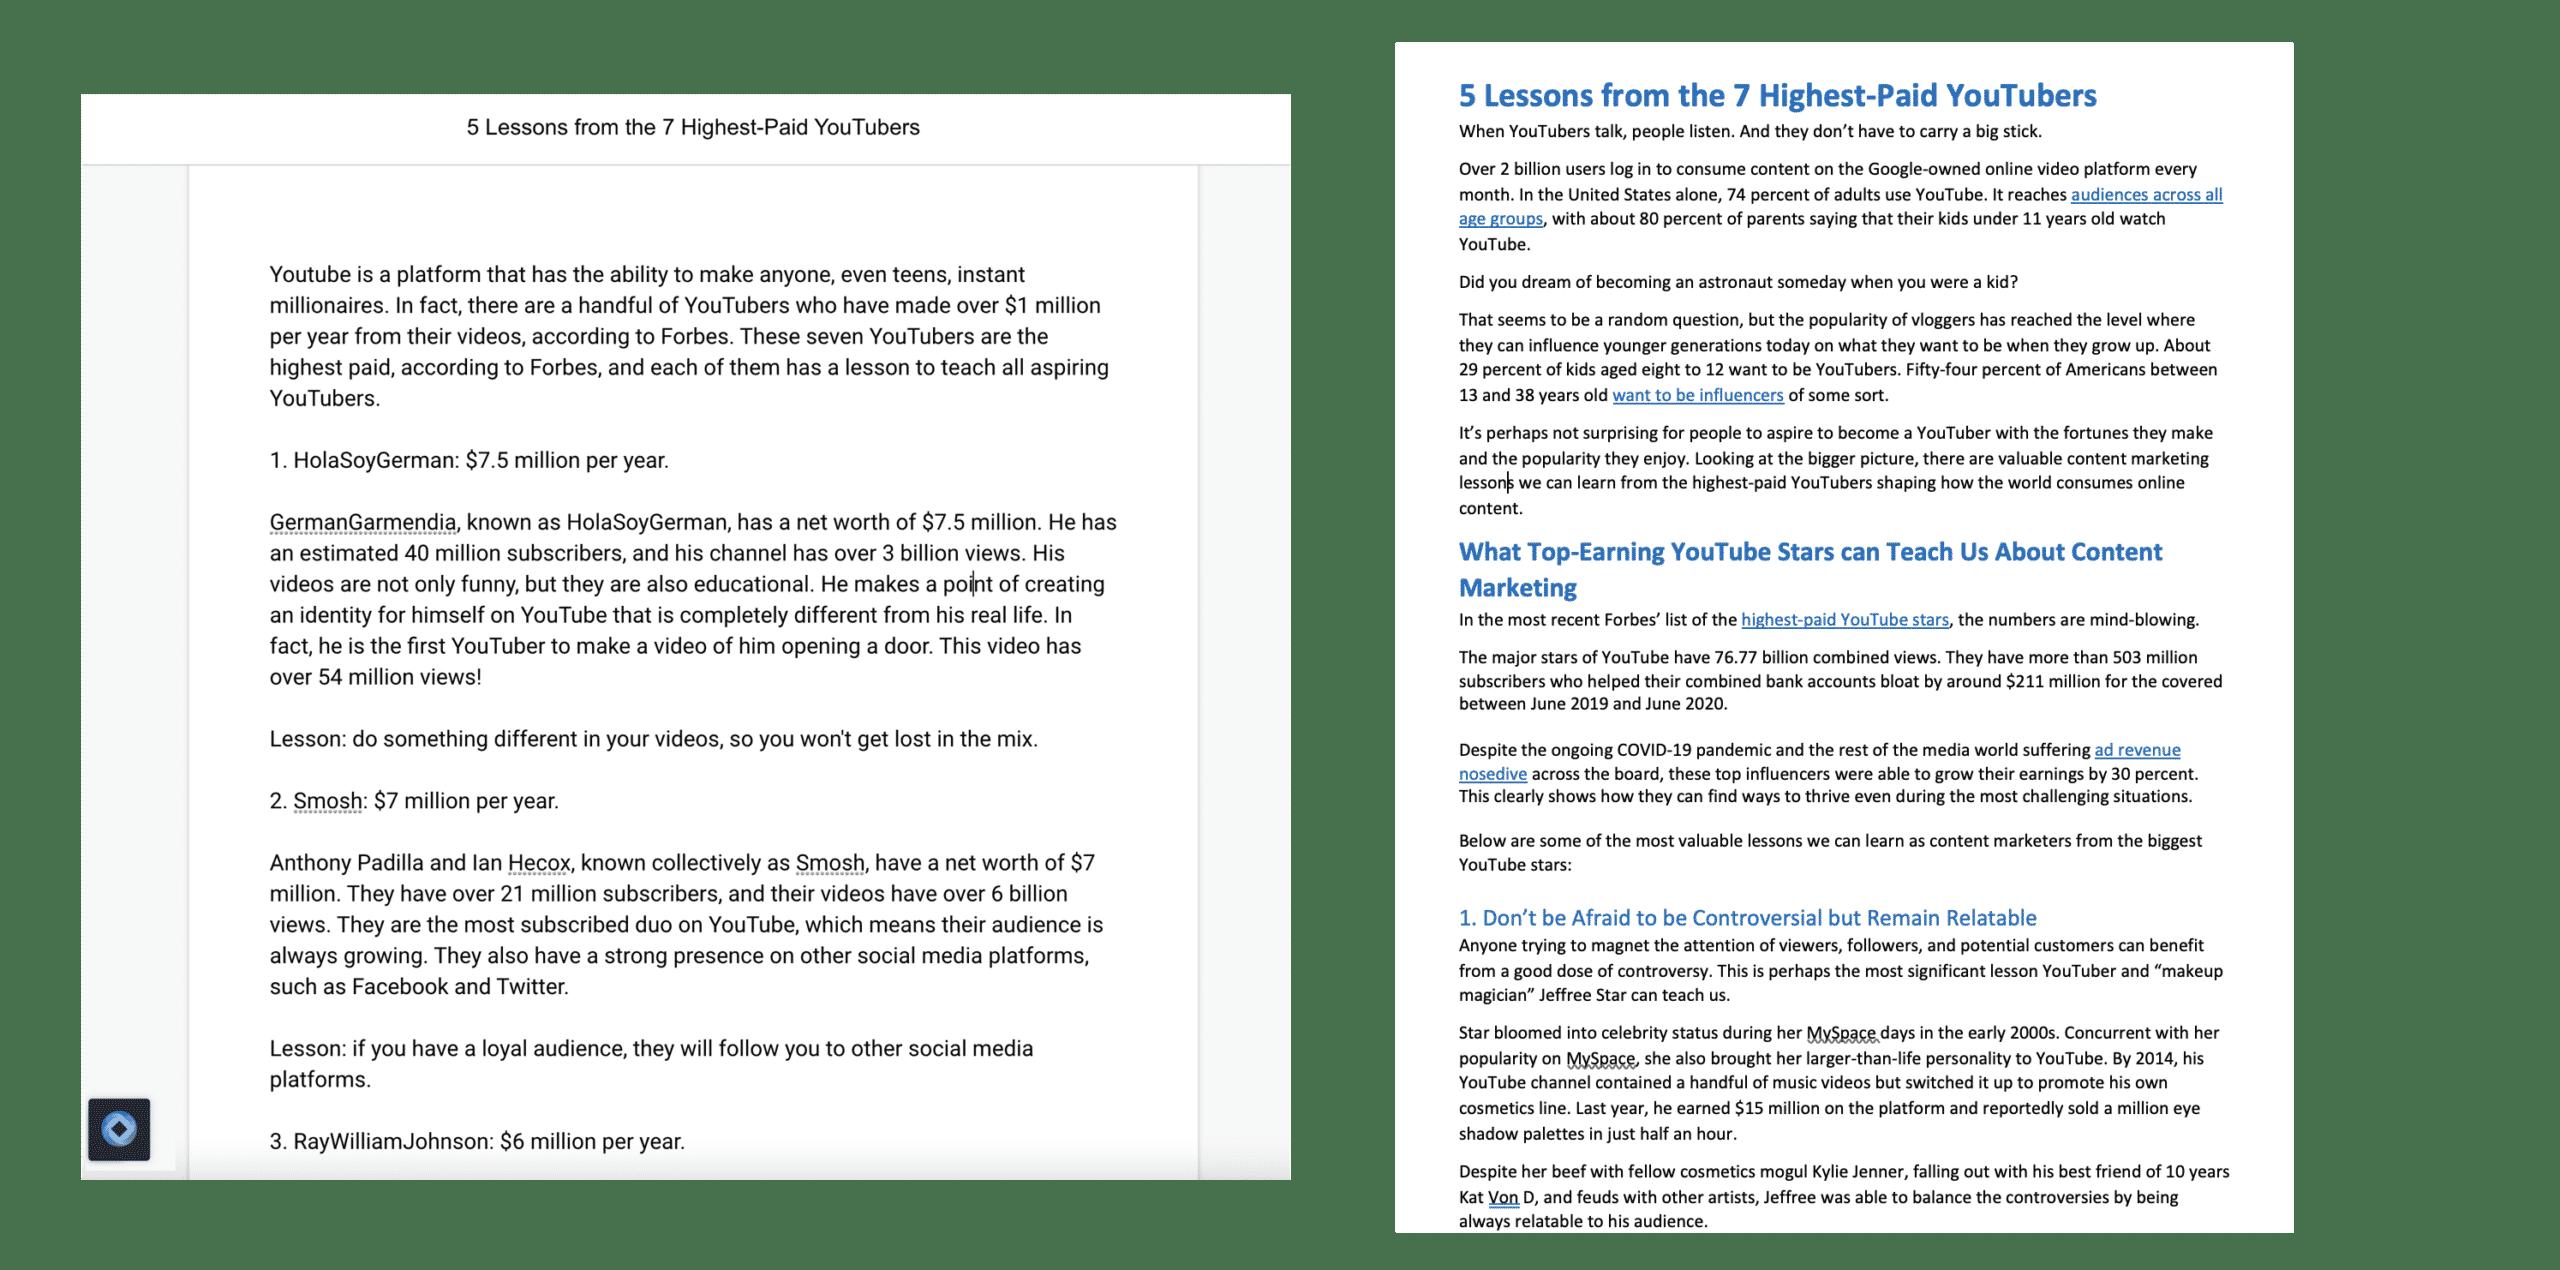 side-by-side comparison: gpt-3 vs human writer